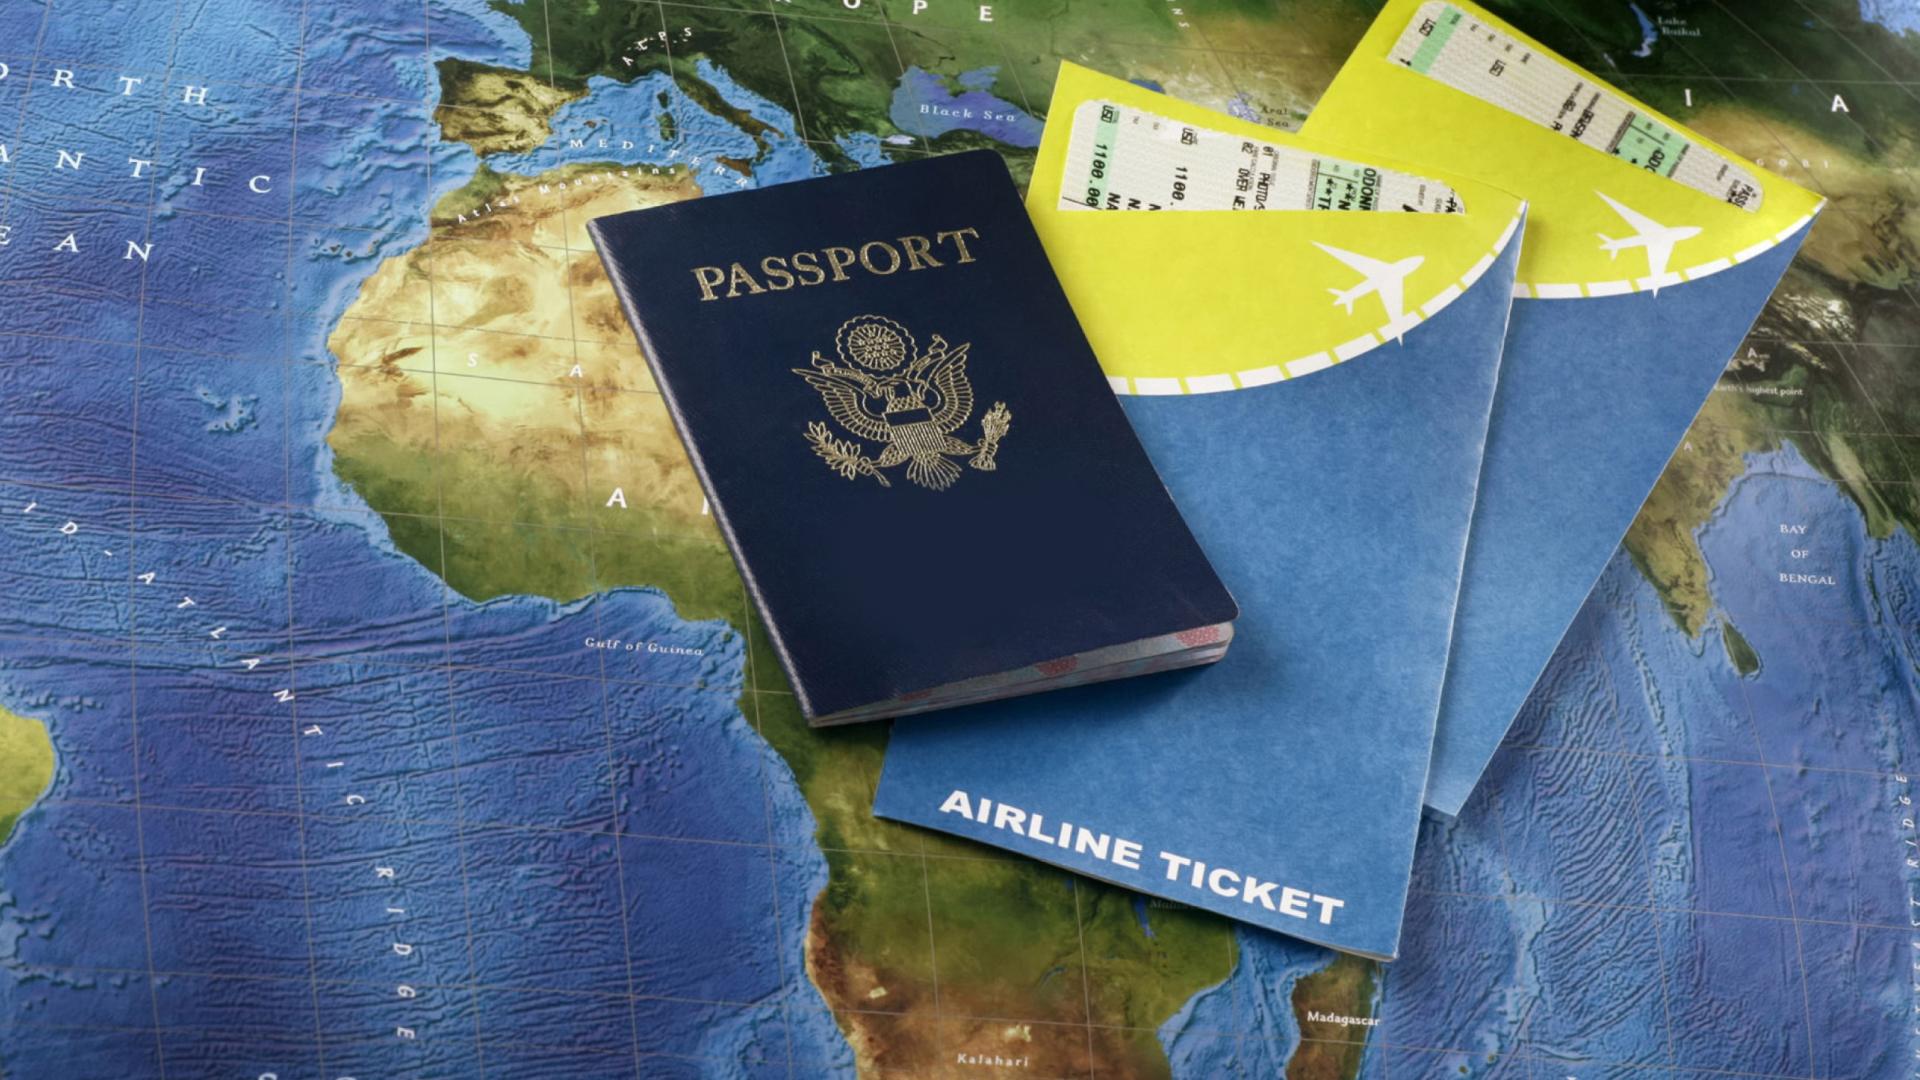 World travel tourism passport visa 19201080 religious air world travel tourism passport visa 19201080 thecheapjerseys Image collections